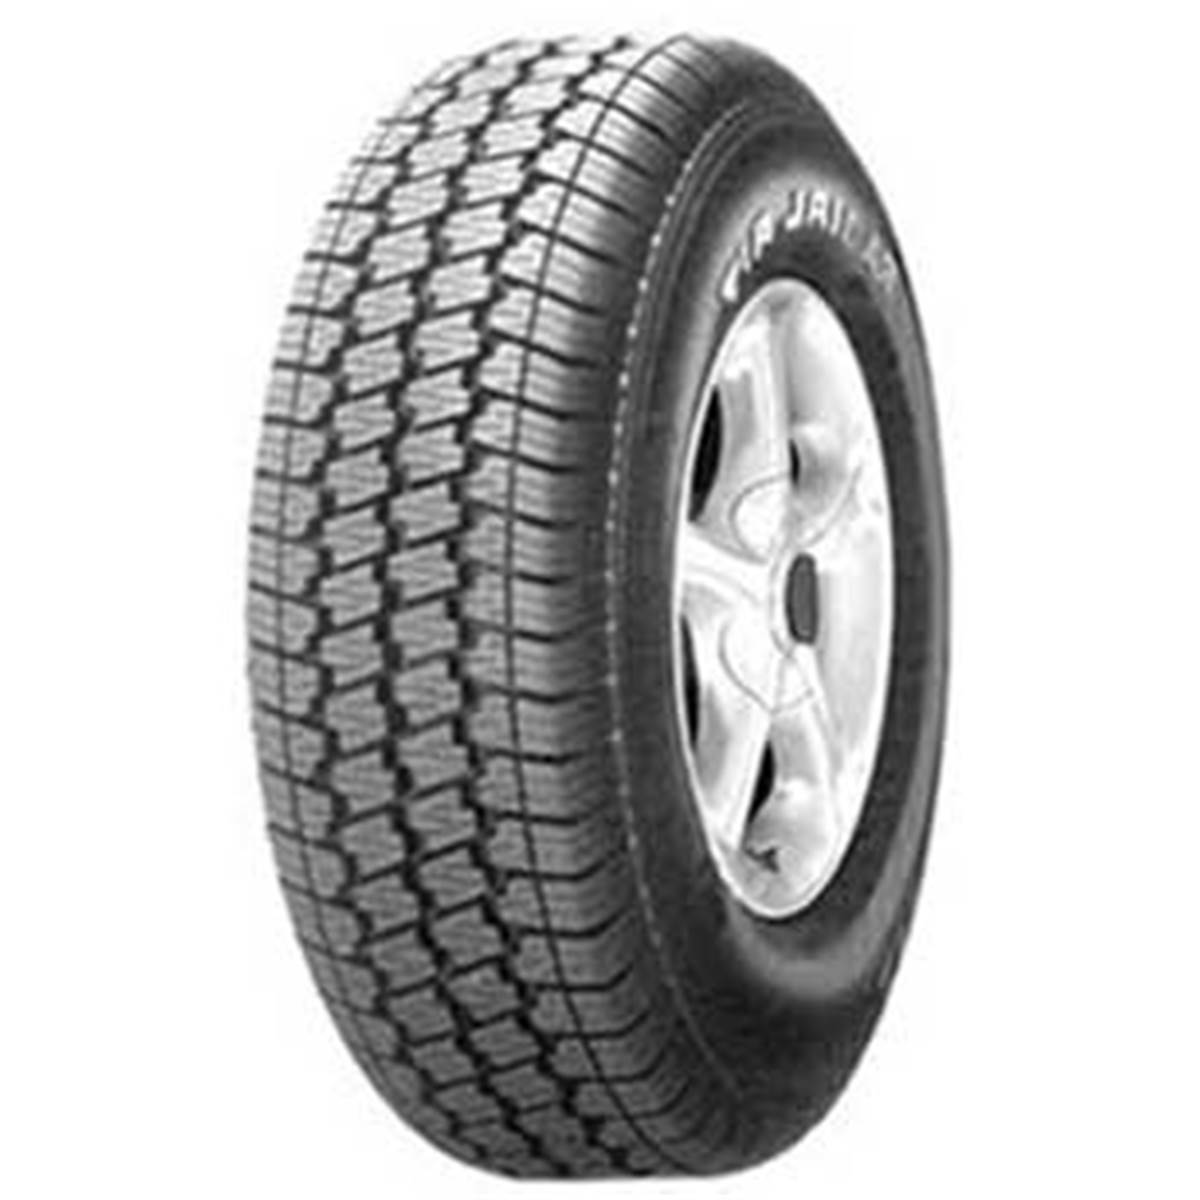 nexen radial at rv achat de pneus nexen radial at rv pas cher comparer les prix du pneu nexen. Black Bedroom Furniture Sets. Home Design Ideas